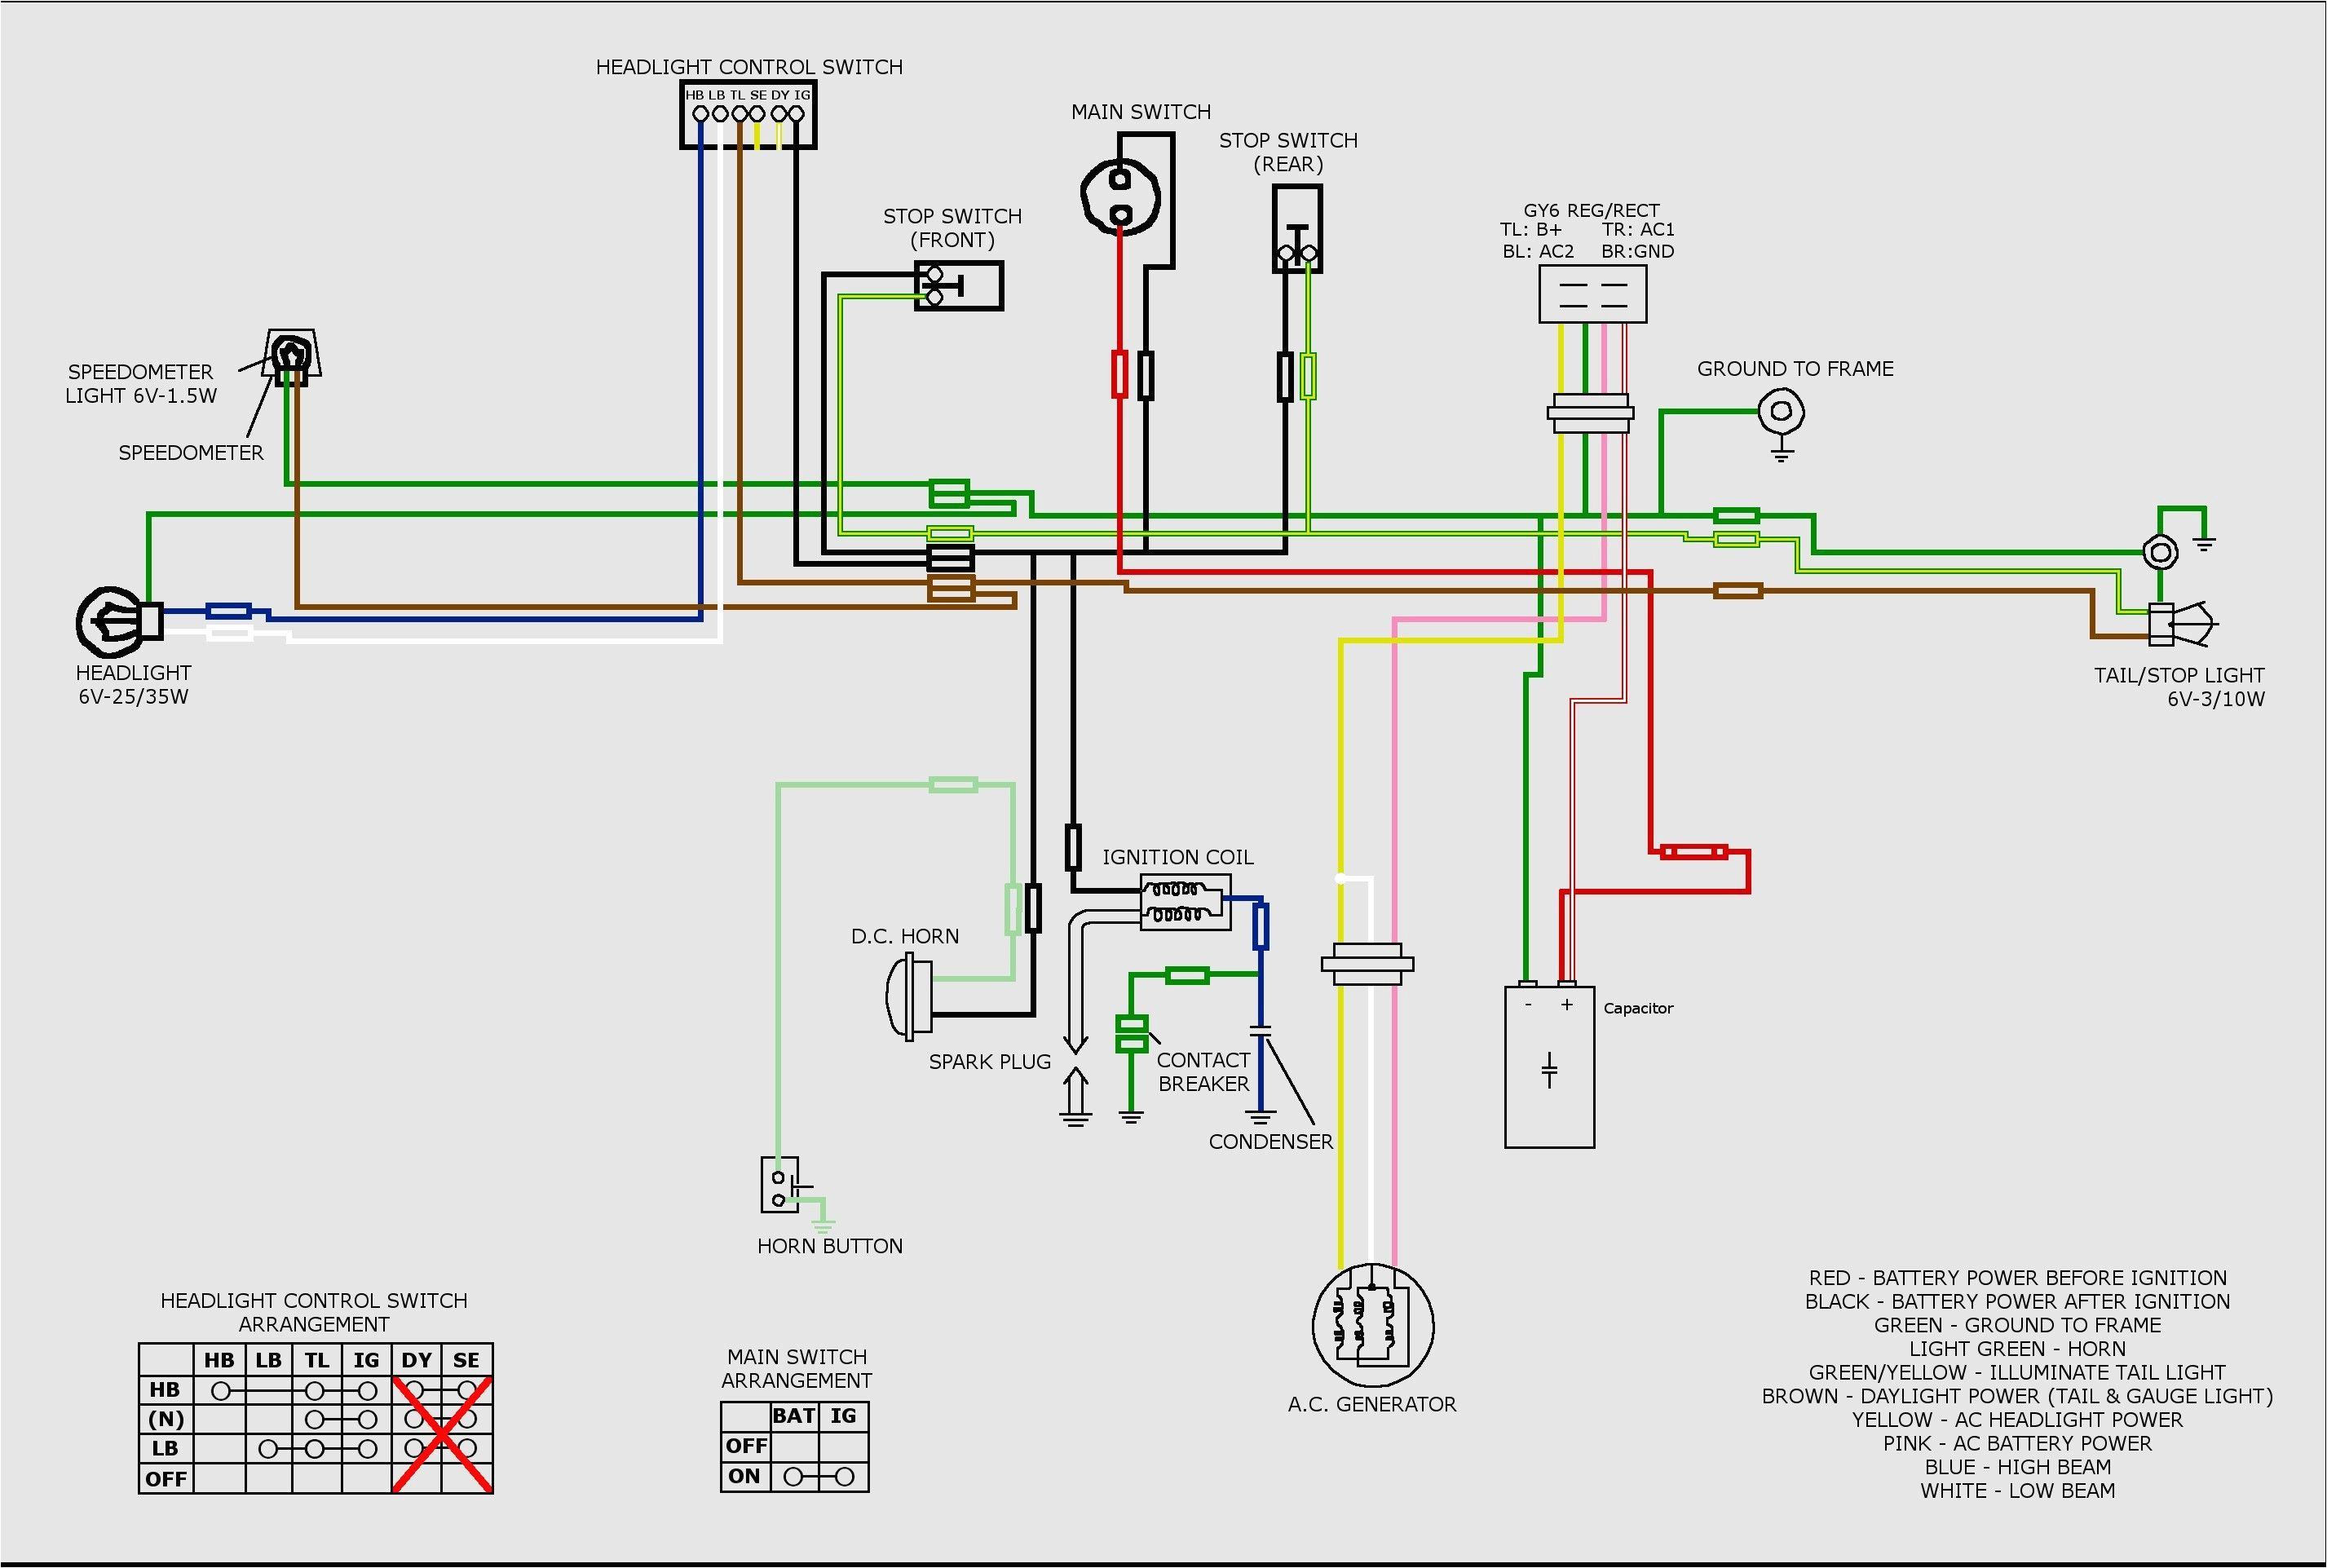 china 125cc wiring diagram wiring diagram today wiring diagram for 125cc atv